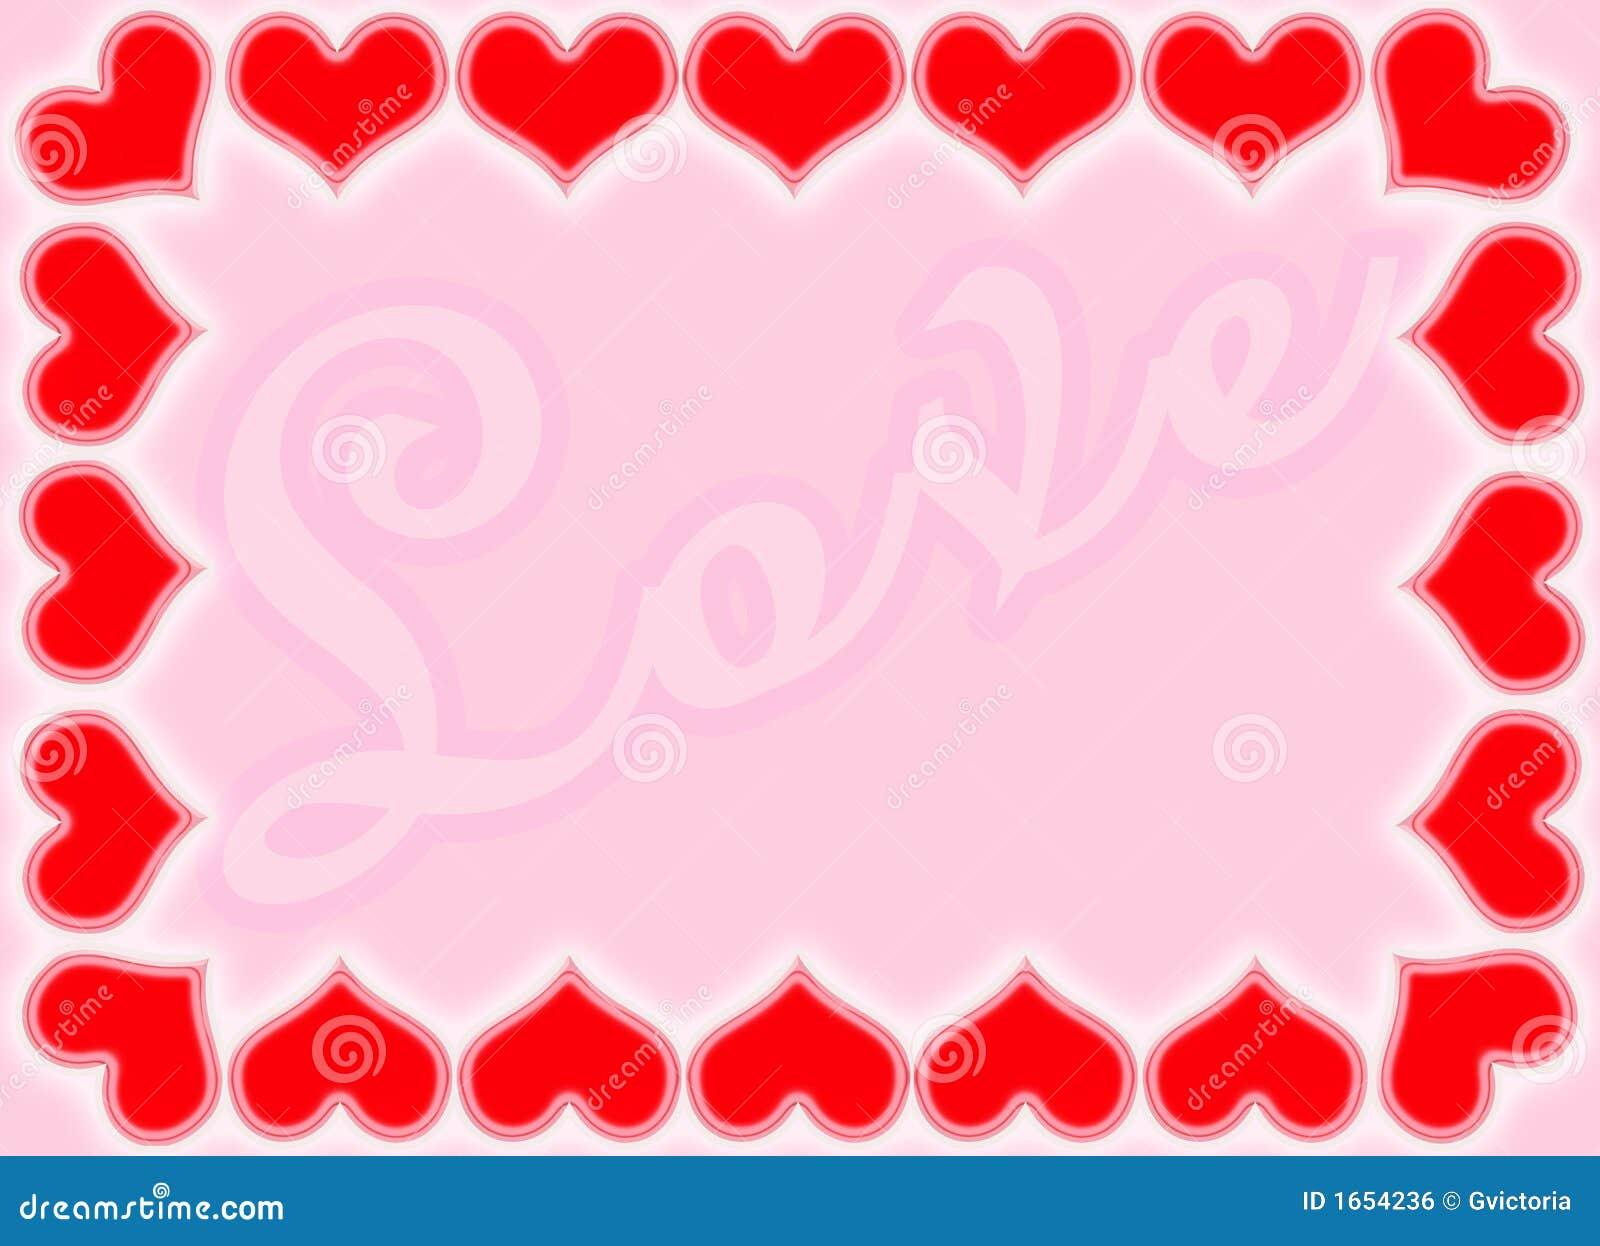 Free Valentine Borders San valentino frontiere